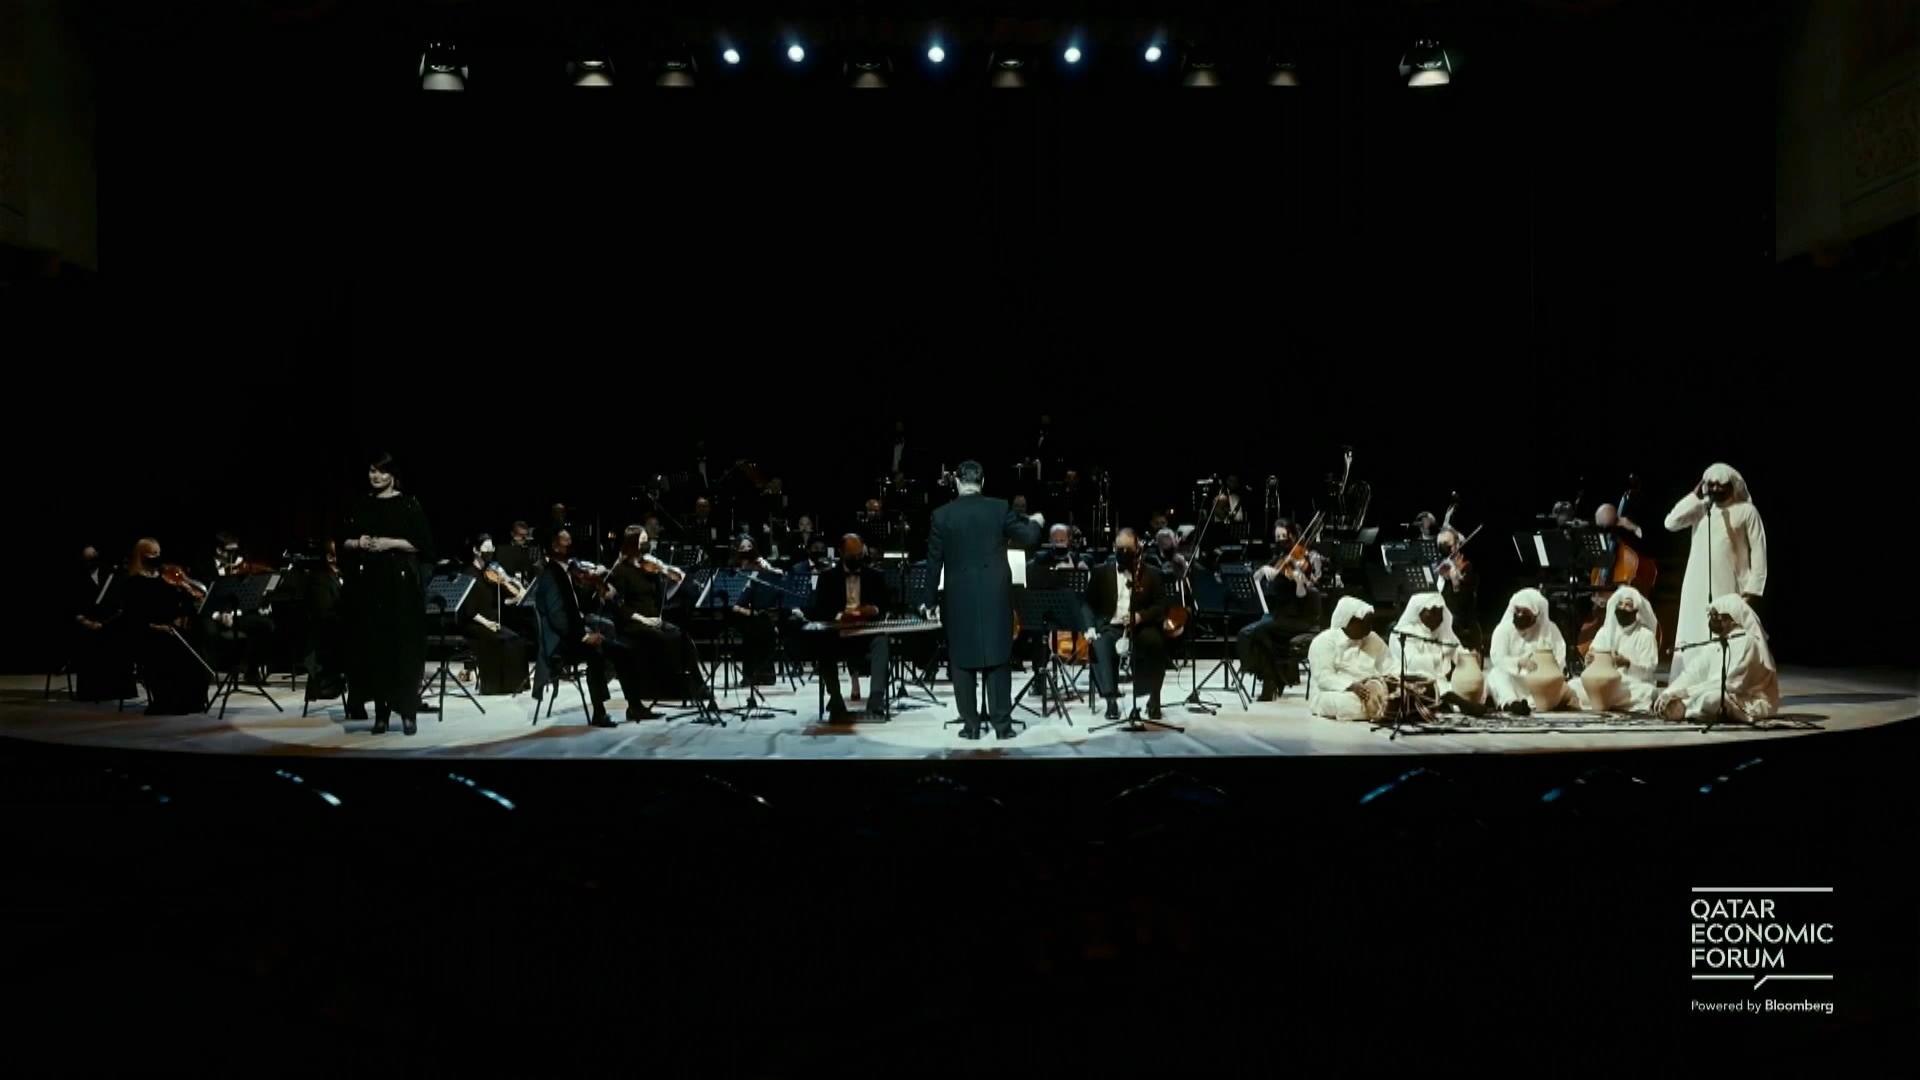 Qatar Philharmonic Orchestra Performs at Qatar Economic Forum